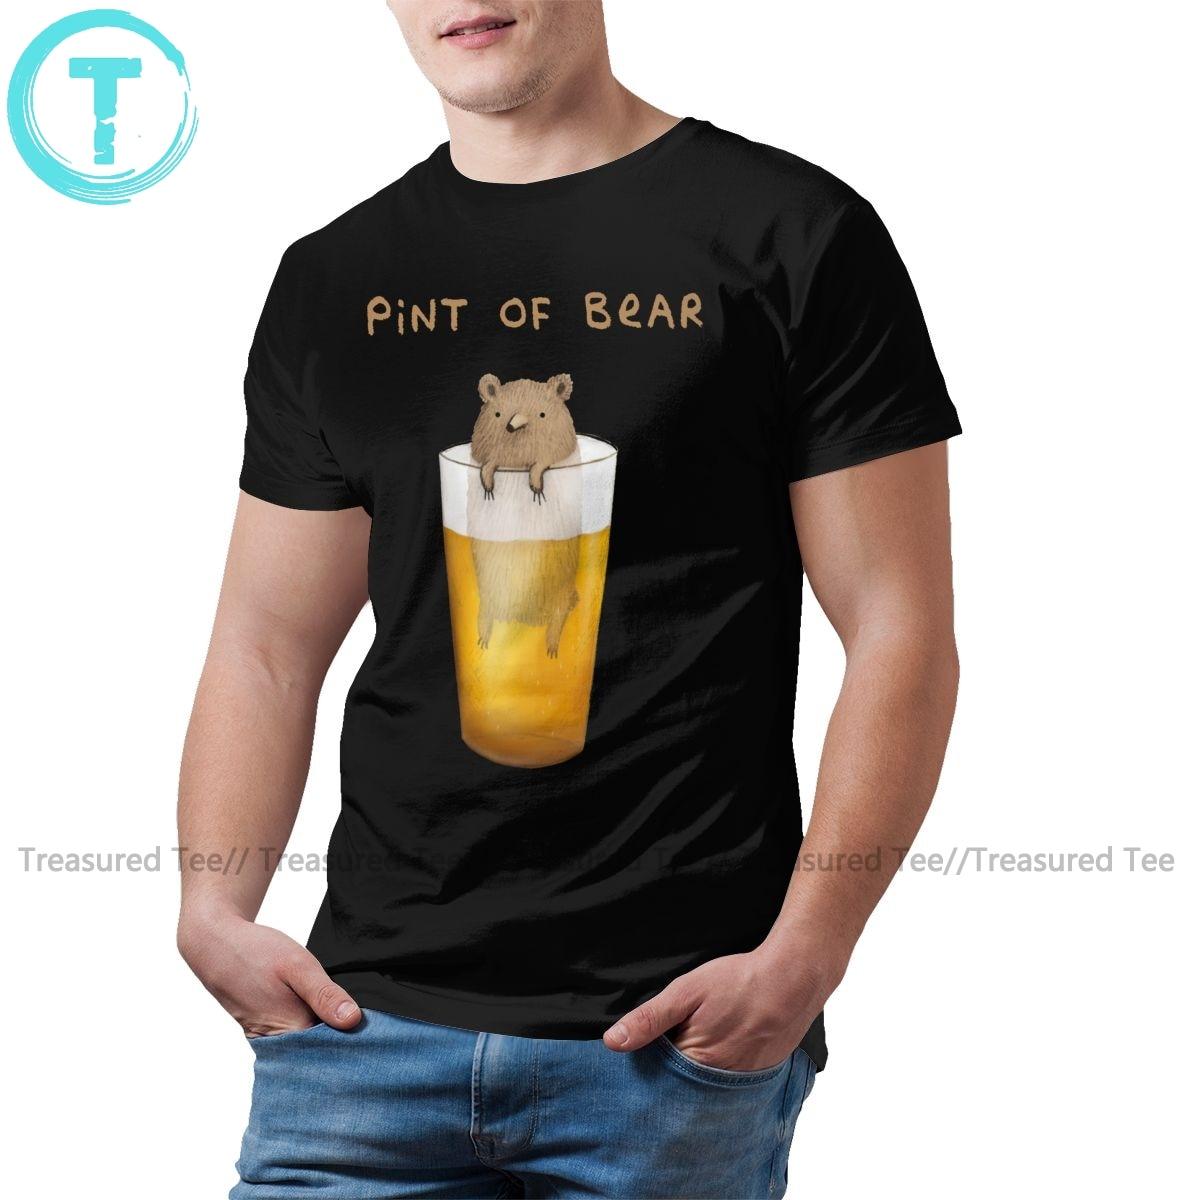 Grizzly T Shirt Pint Of Bear T-Shirt 5xl Cotton Tee Shirt Man Short-Sleeve Graphic Basic Awesome Tshirt